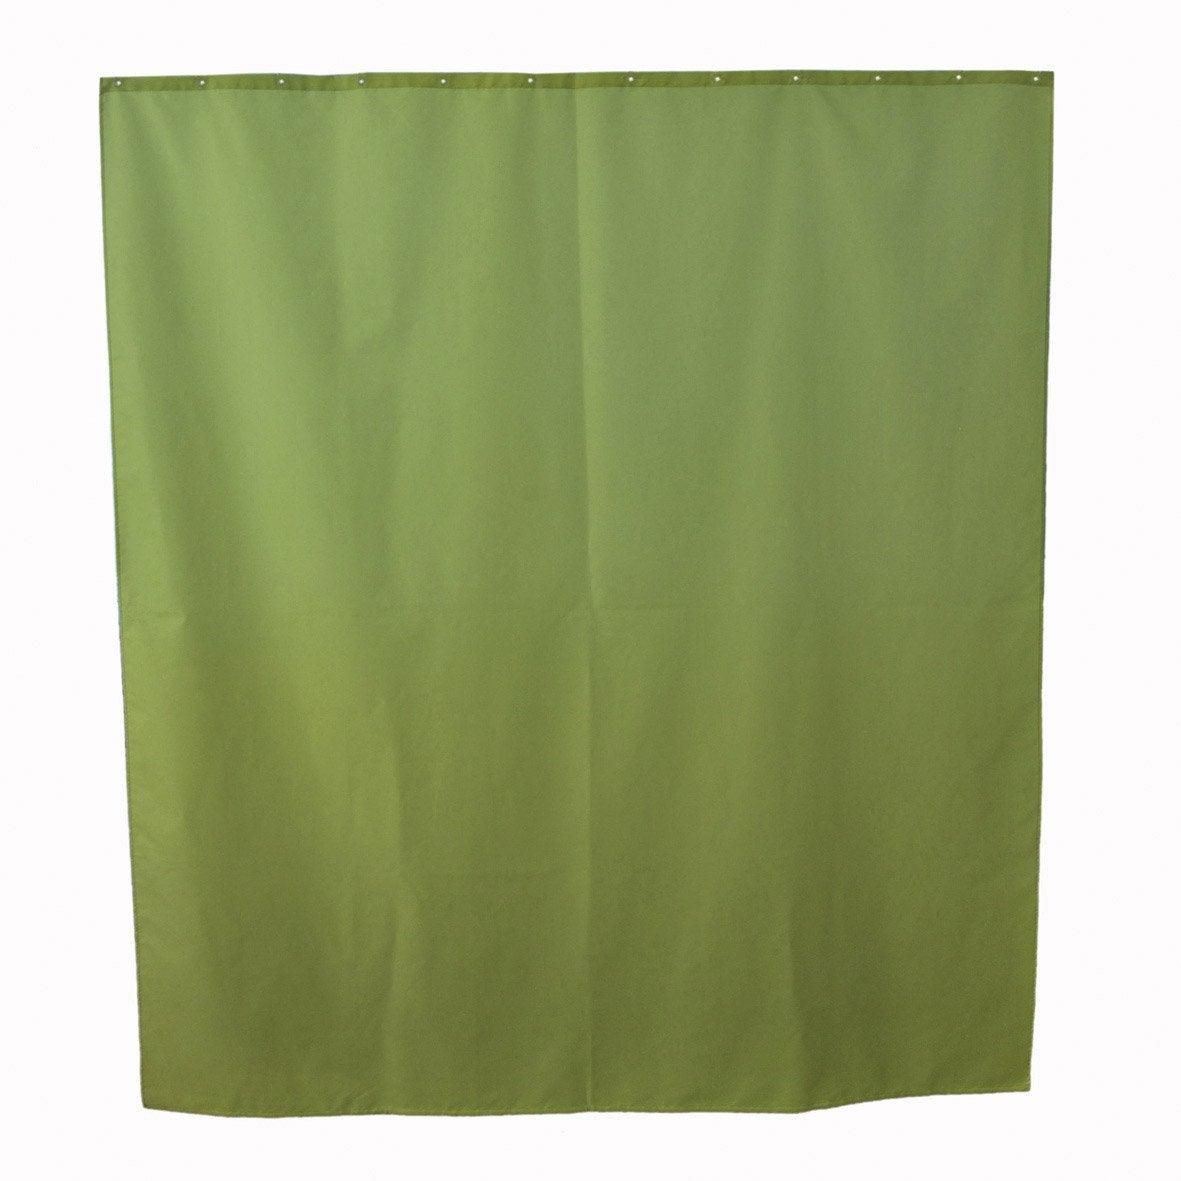 Rideau de douche en tissu x cm jaune anis n 3 for Rideau de douche en tissu